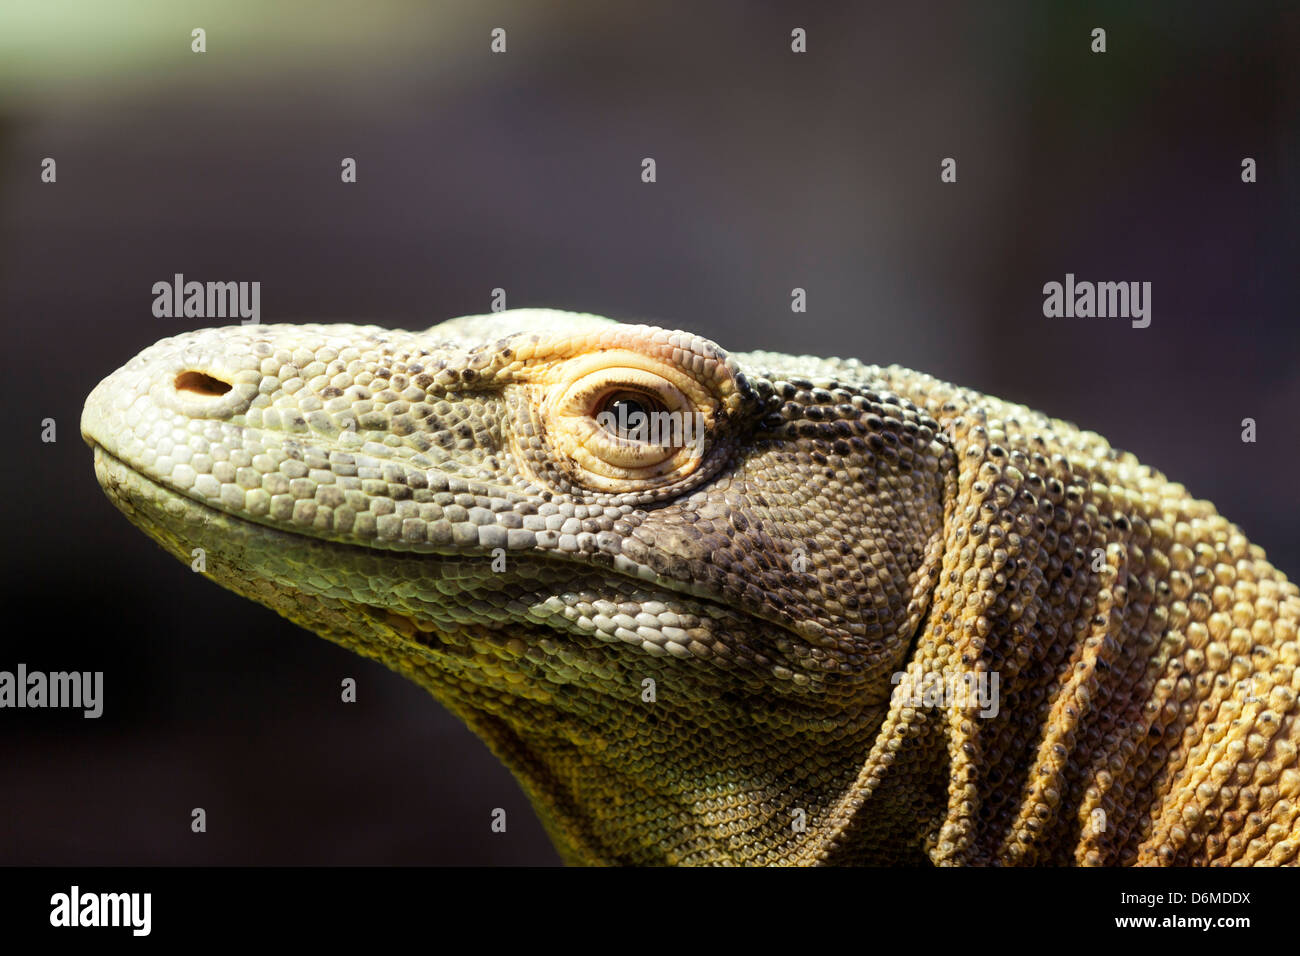 Komodo Dragon, Porträt eines Komodo Drachen. Stockbild